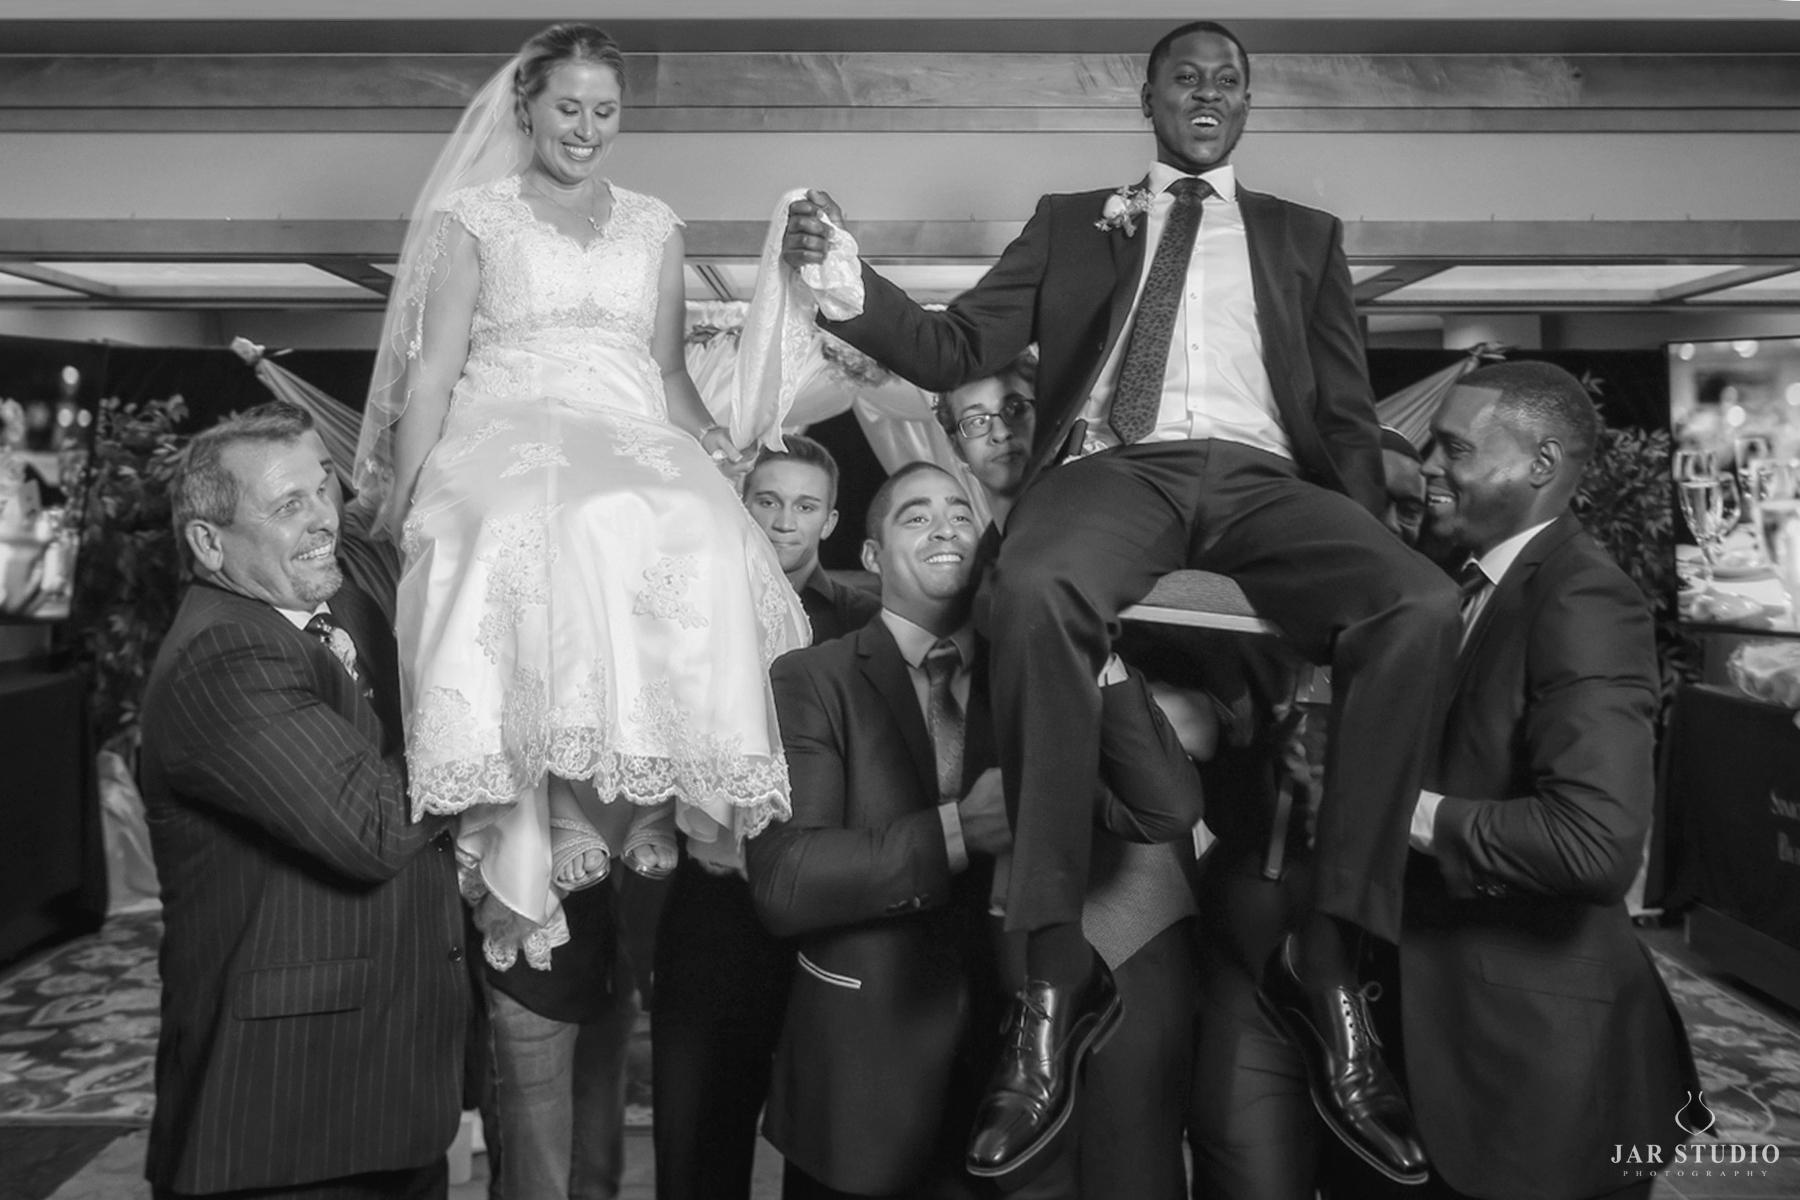 19-groom-bride-hora-jewish-reception-jarstudio-photography.jpg